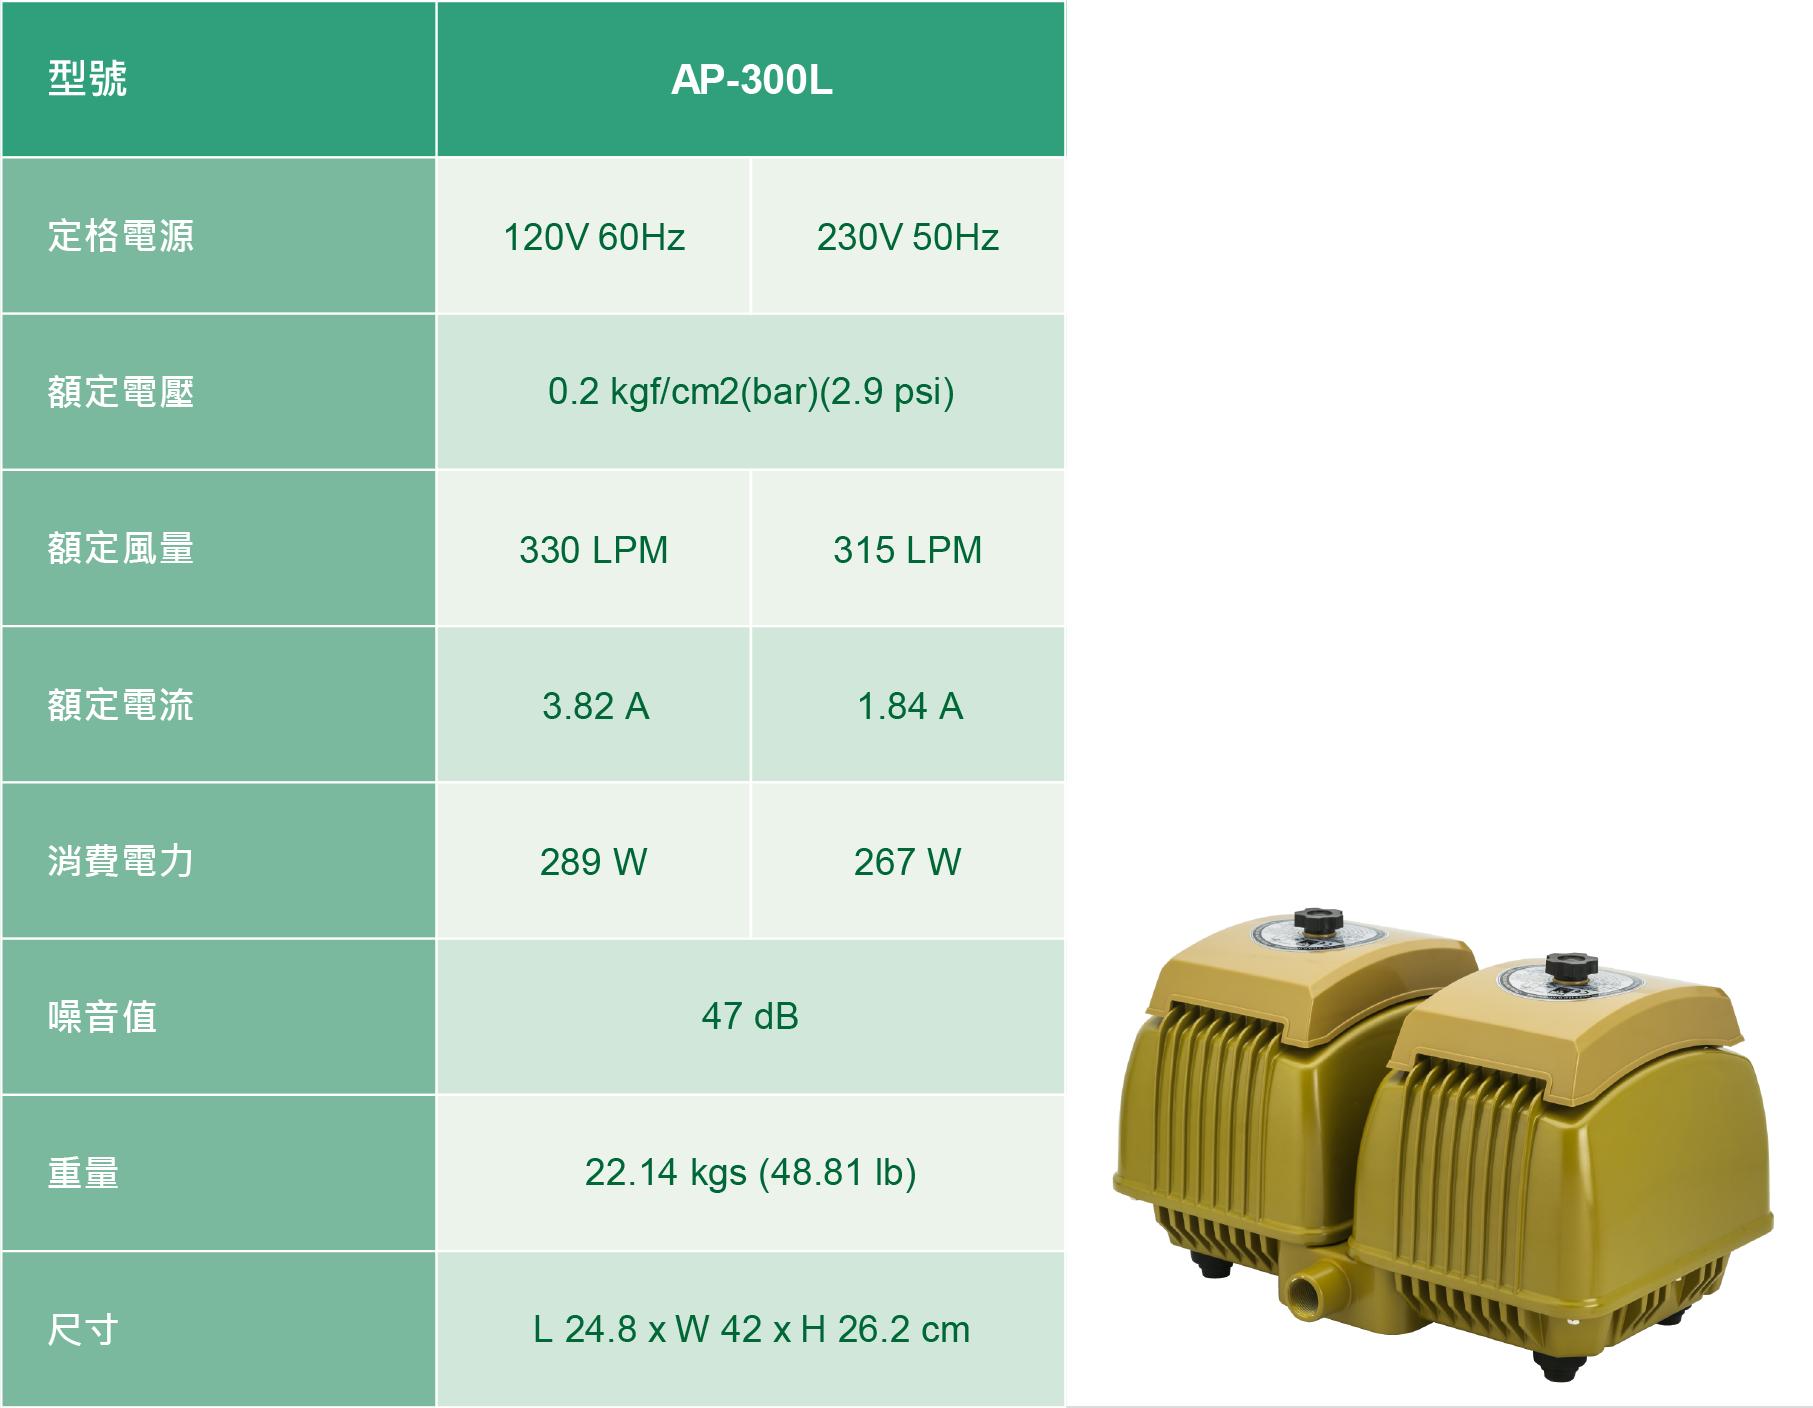 Linear Air Pumps AP-300L Performance